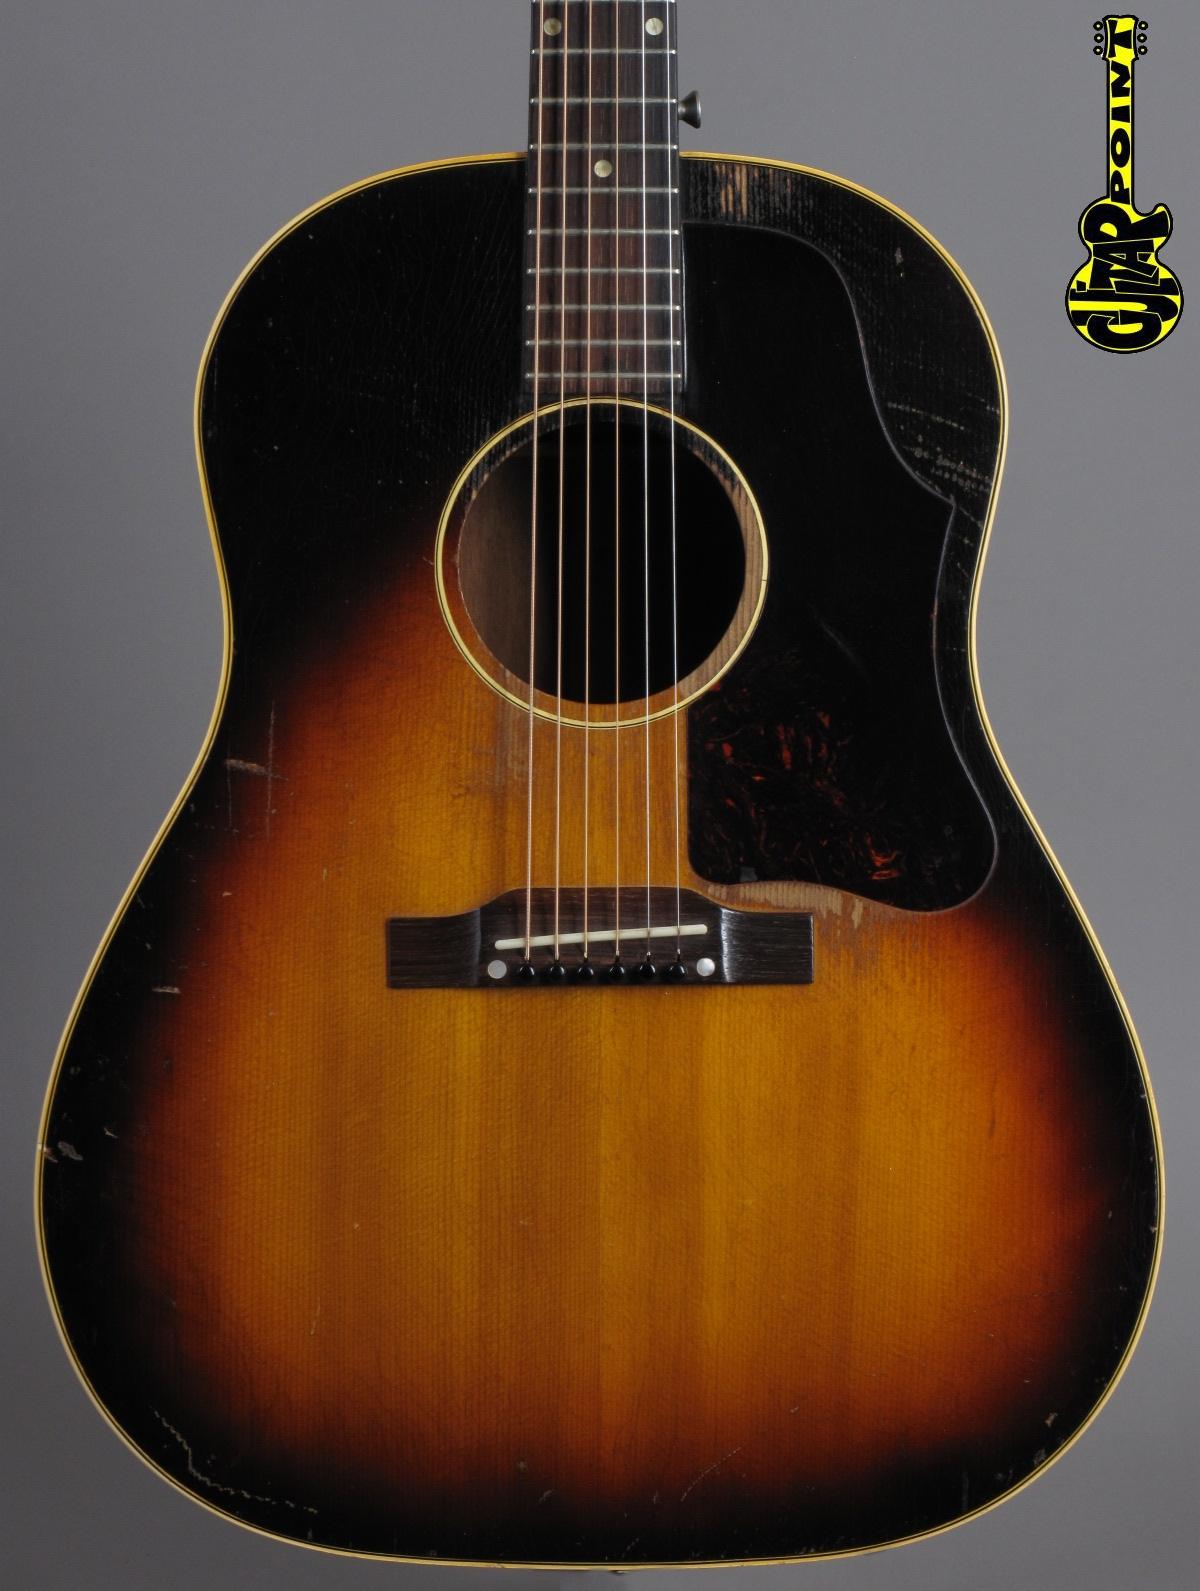 1956 Gibson J-45 - Sunburst